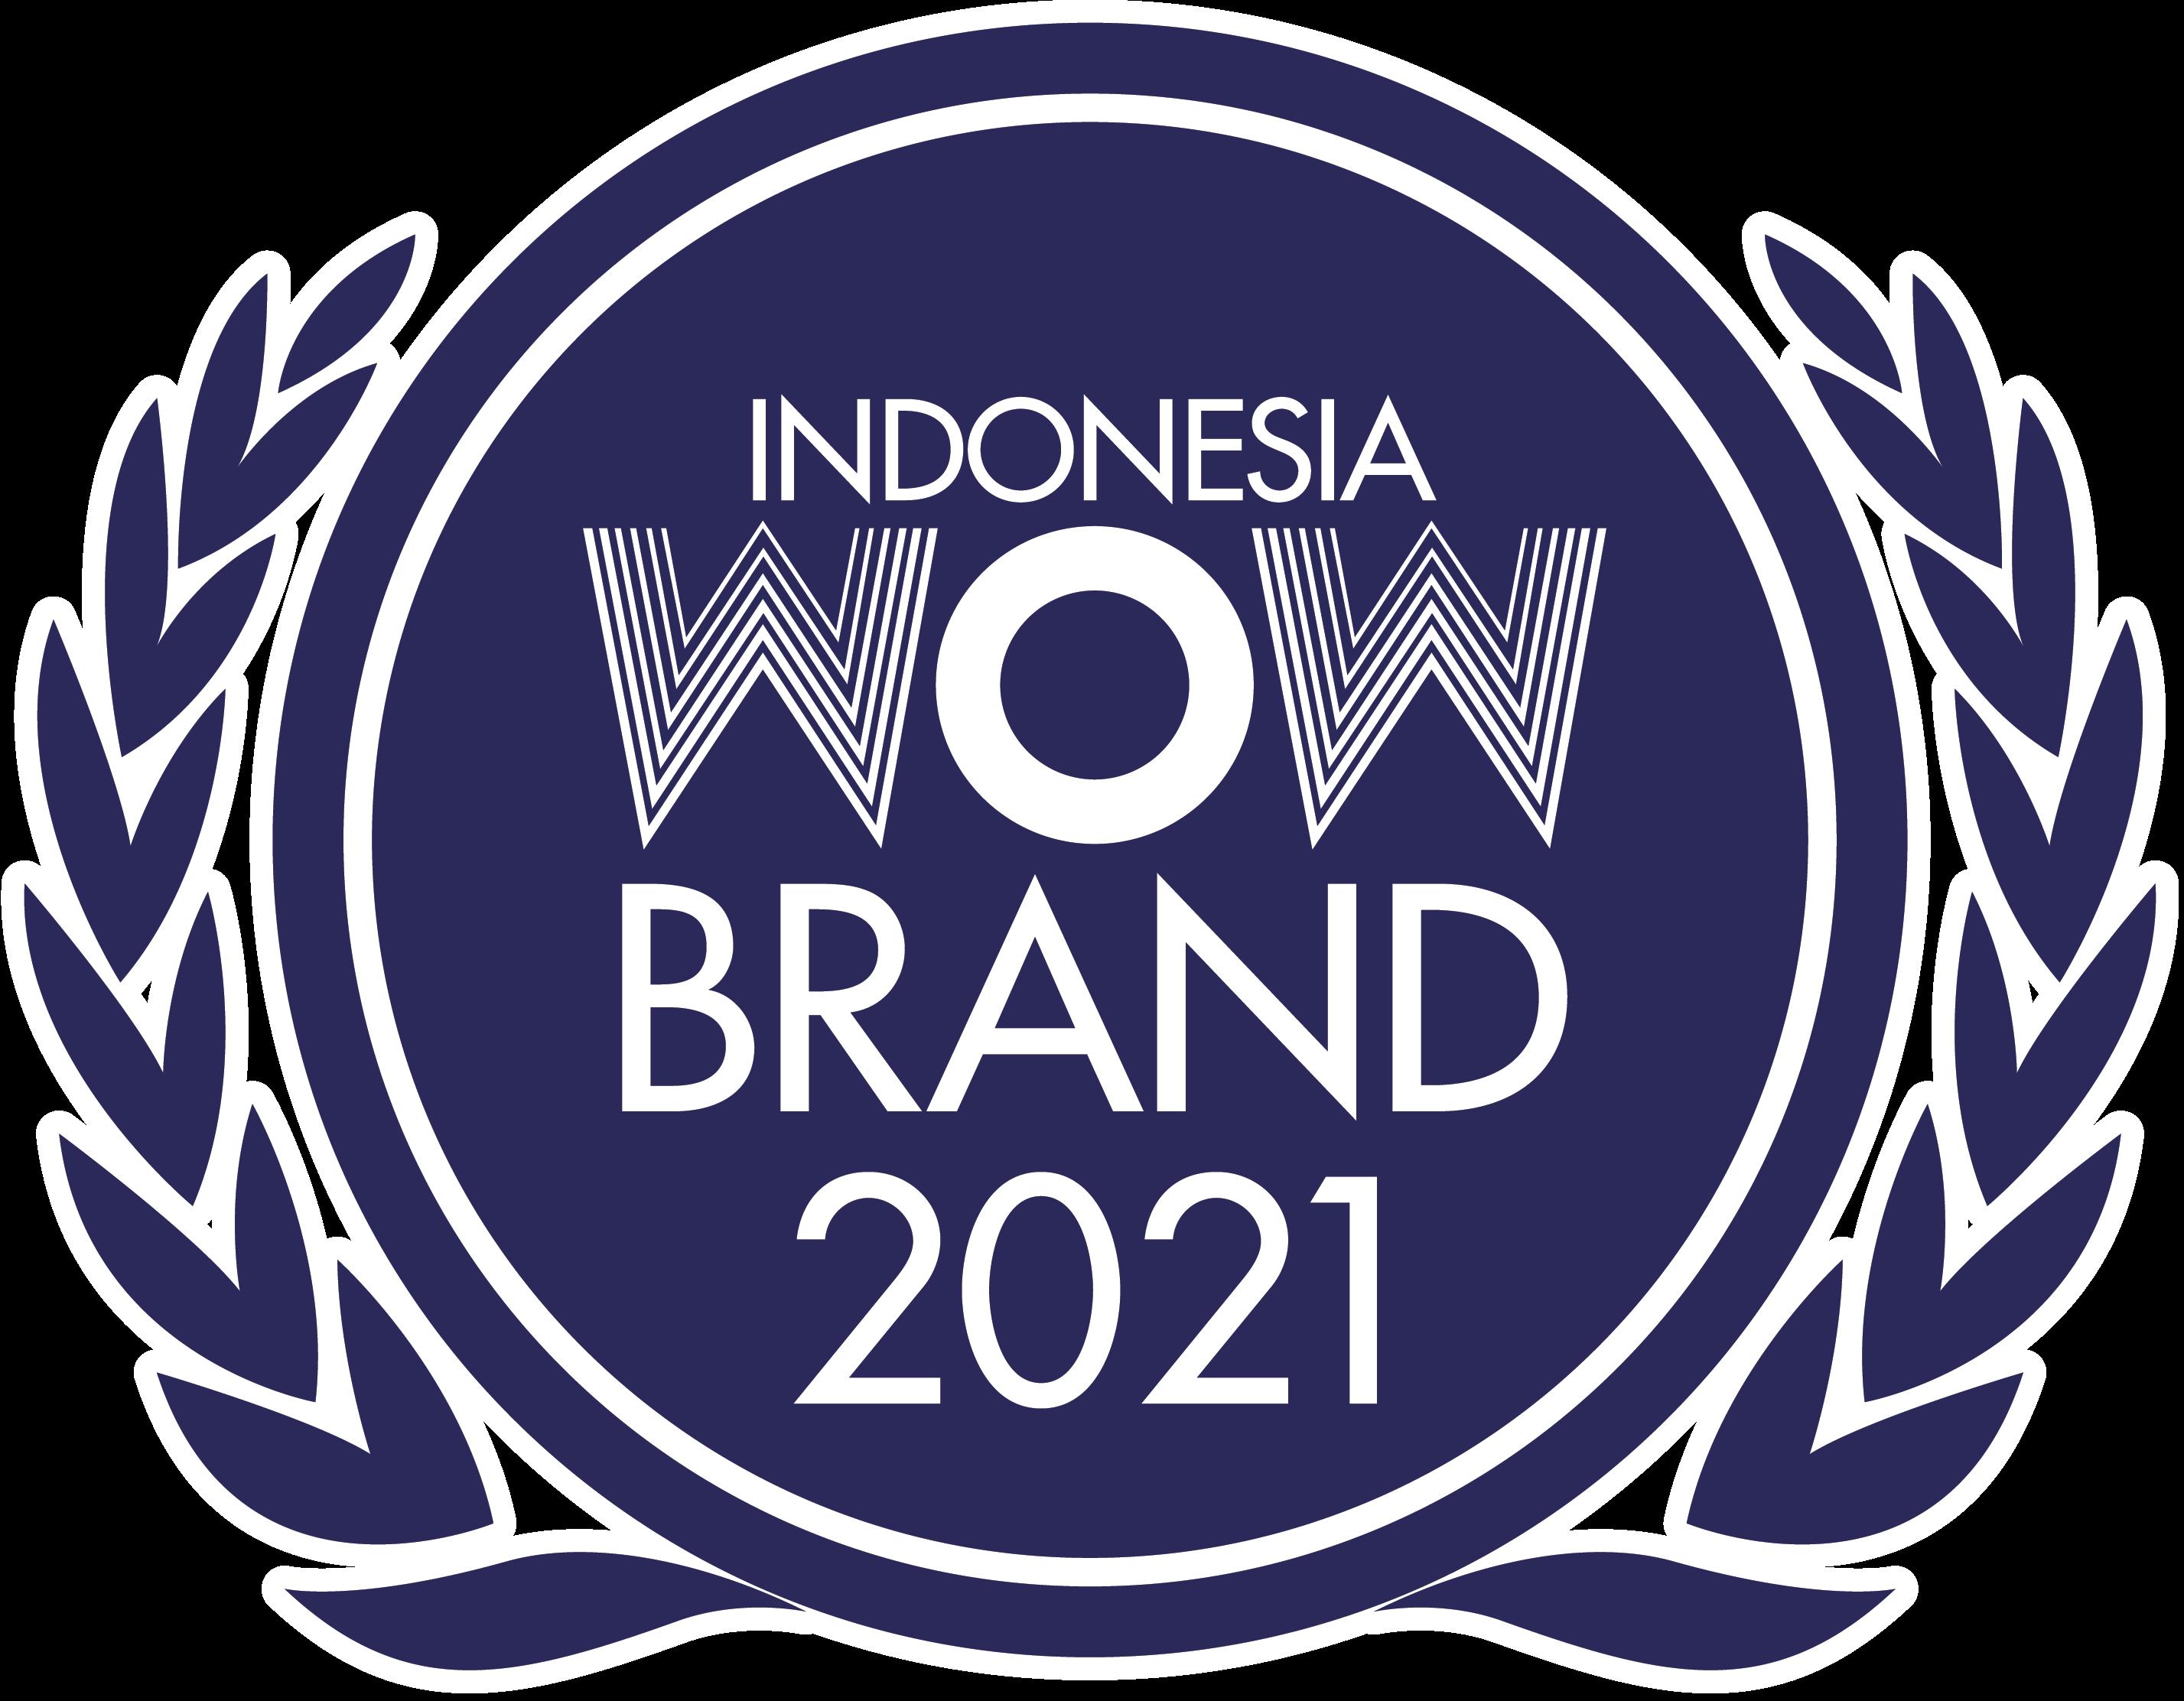 Indonesia WOW Brand 2021